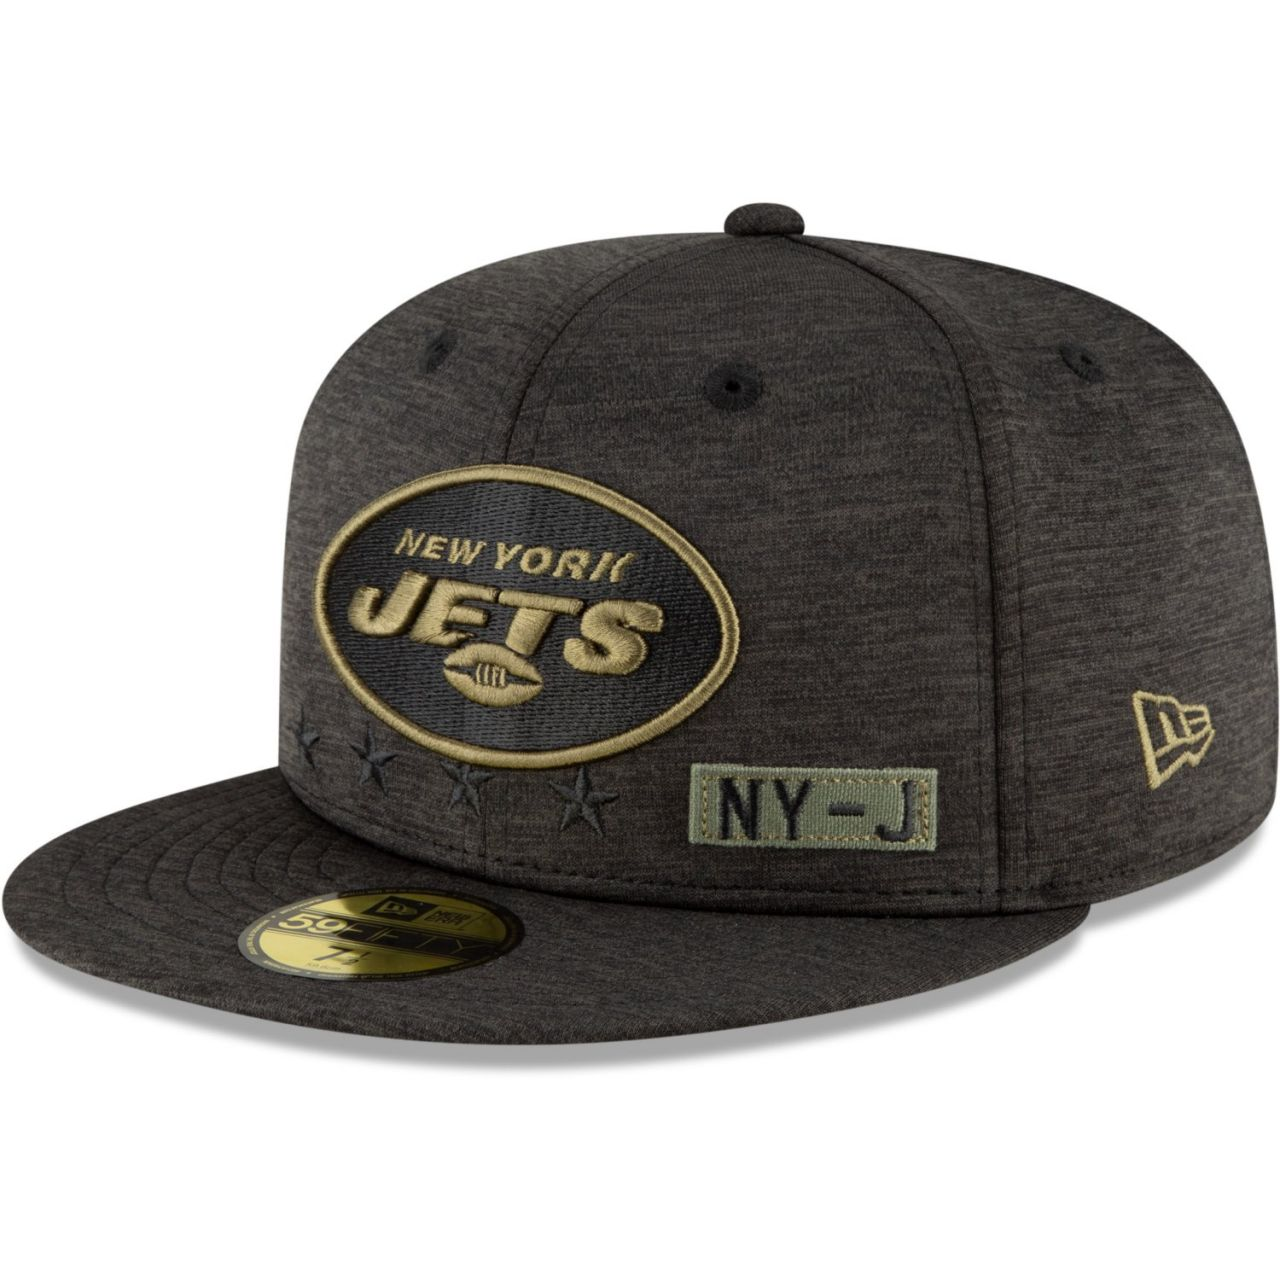 amfoo - New Era 59FIFTY Cap Salute to Service New York Jets